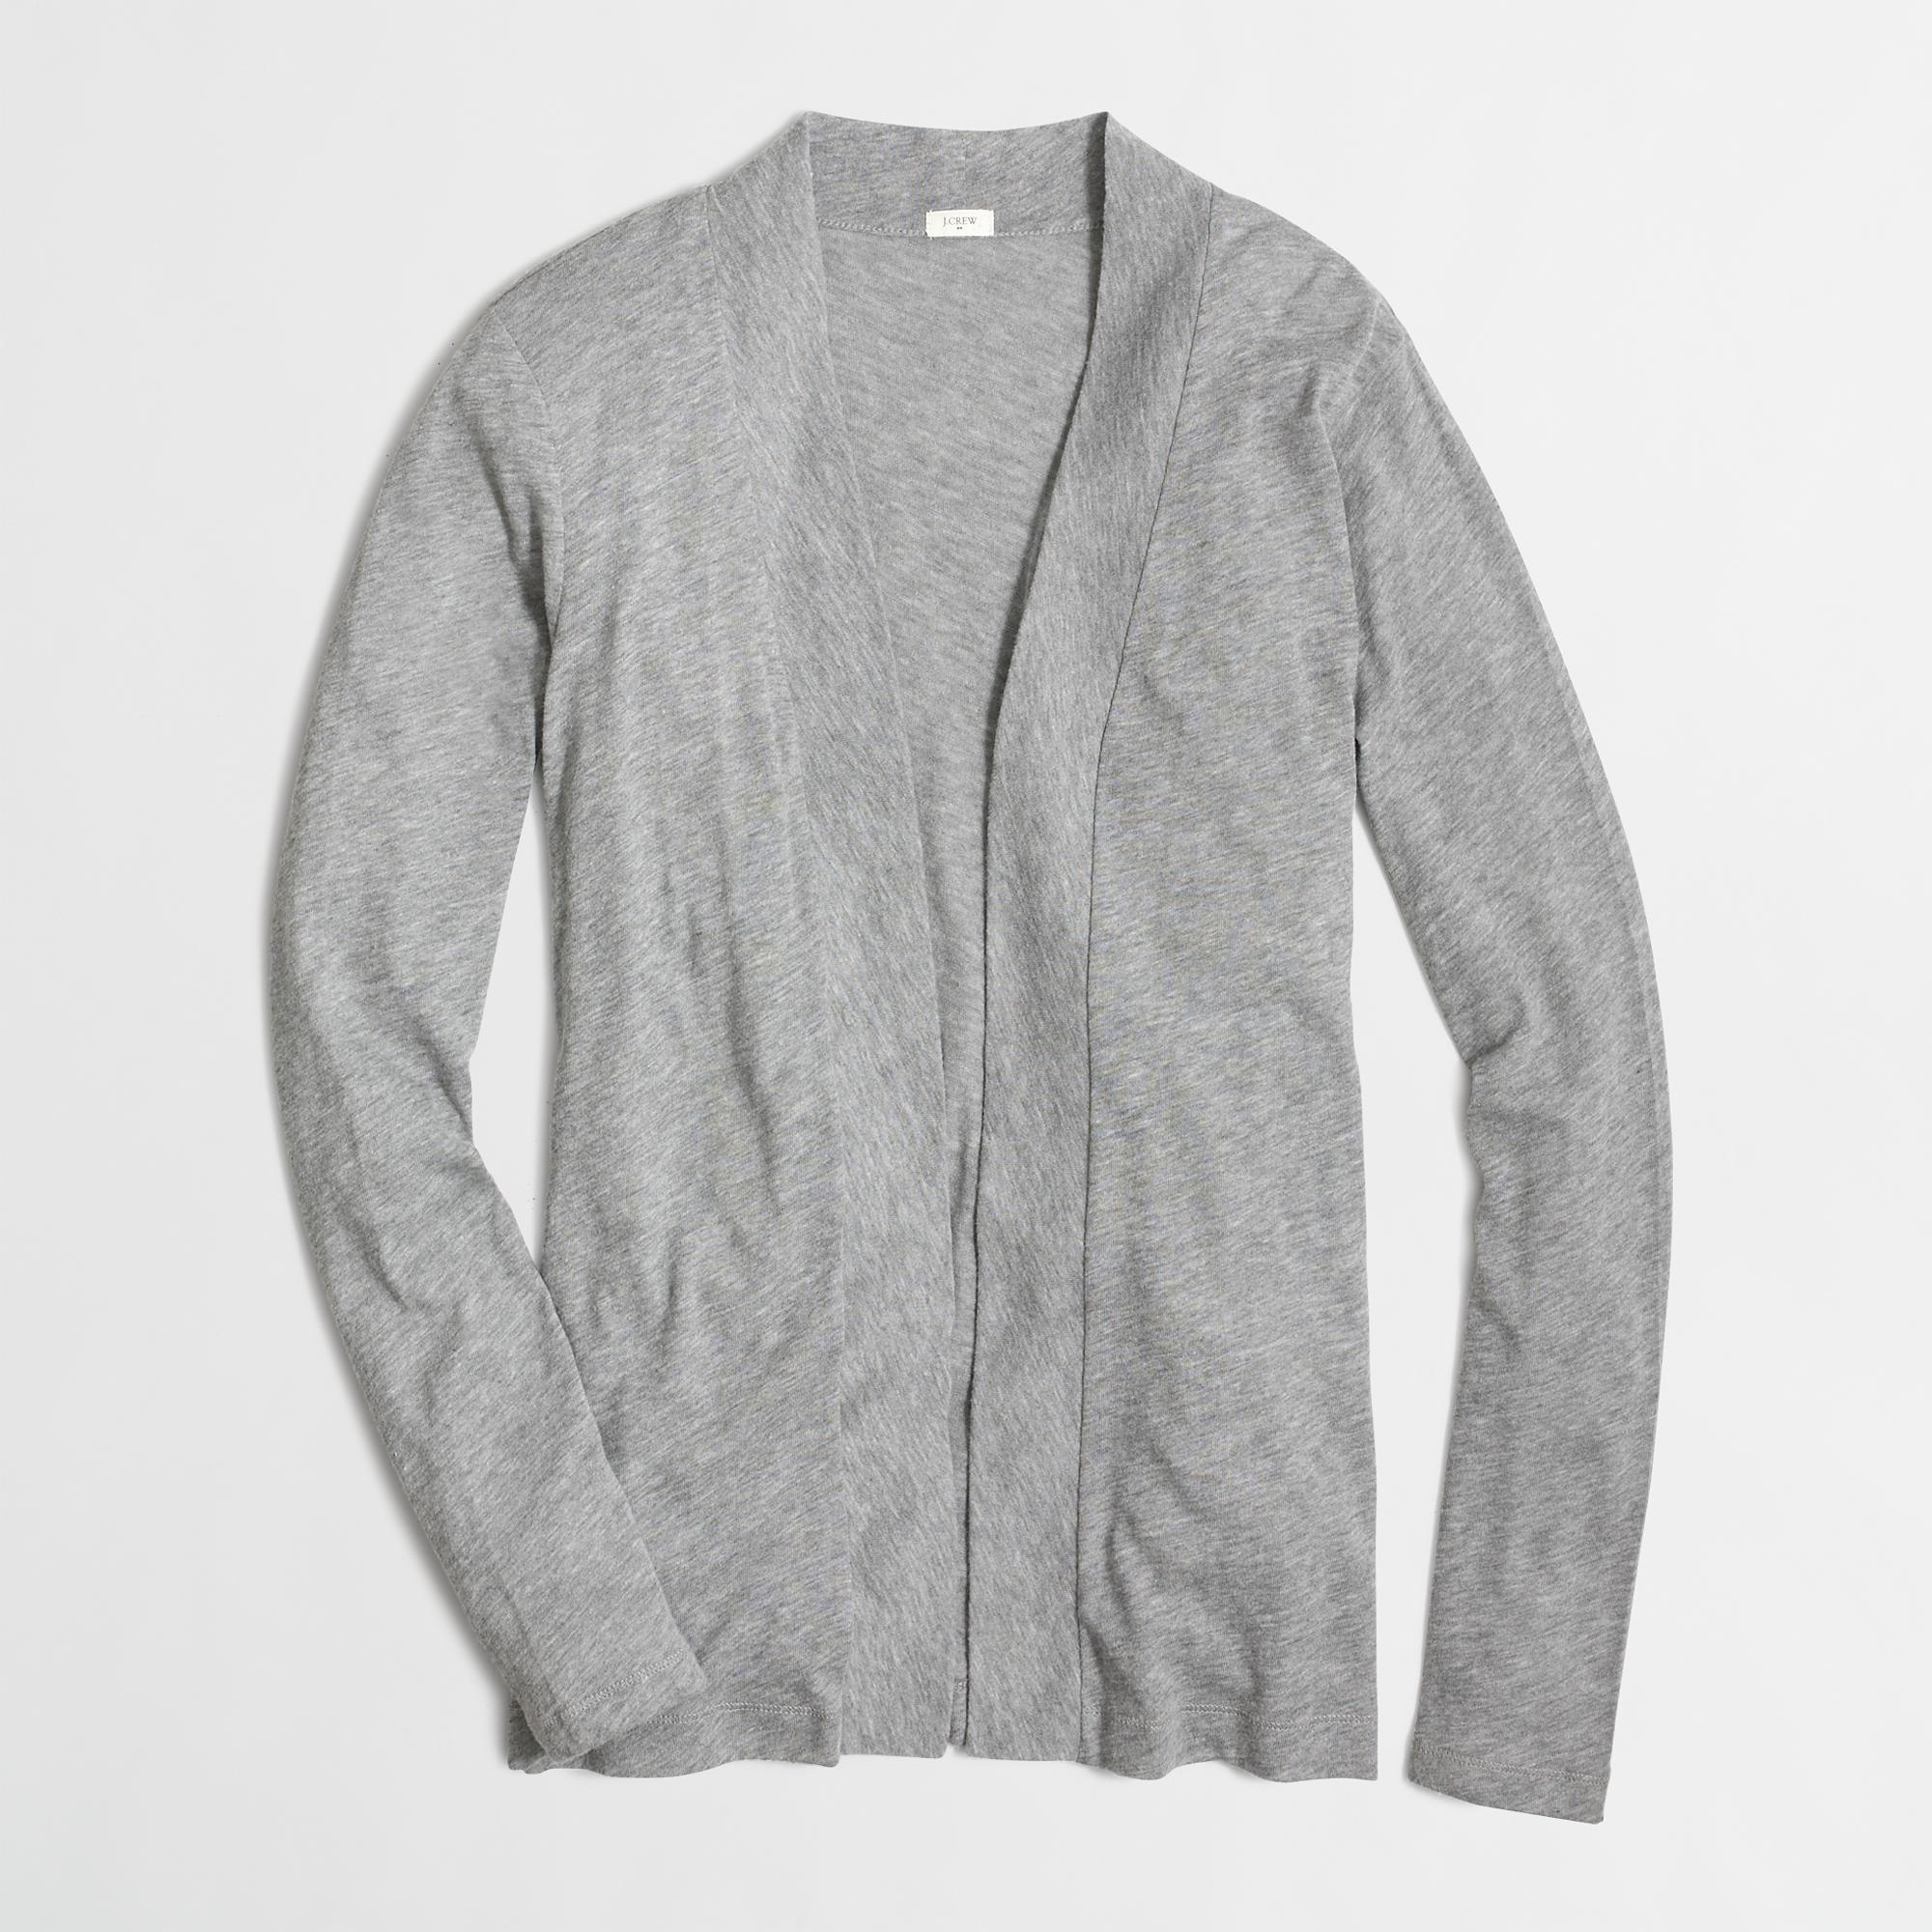 f8e930175d Lyst - J.Crew Factory Always Cardigan Sweater in Gray